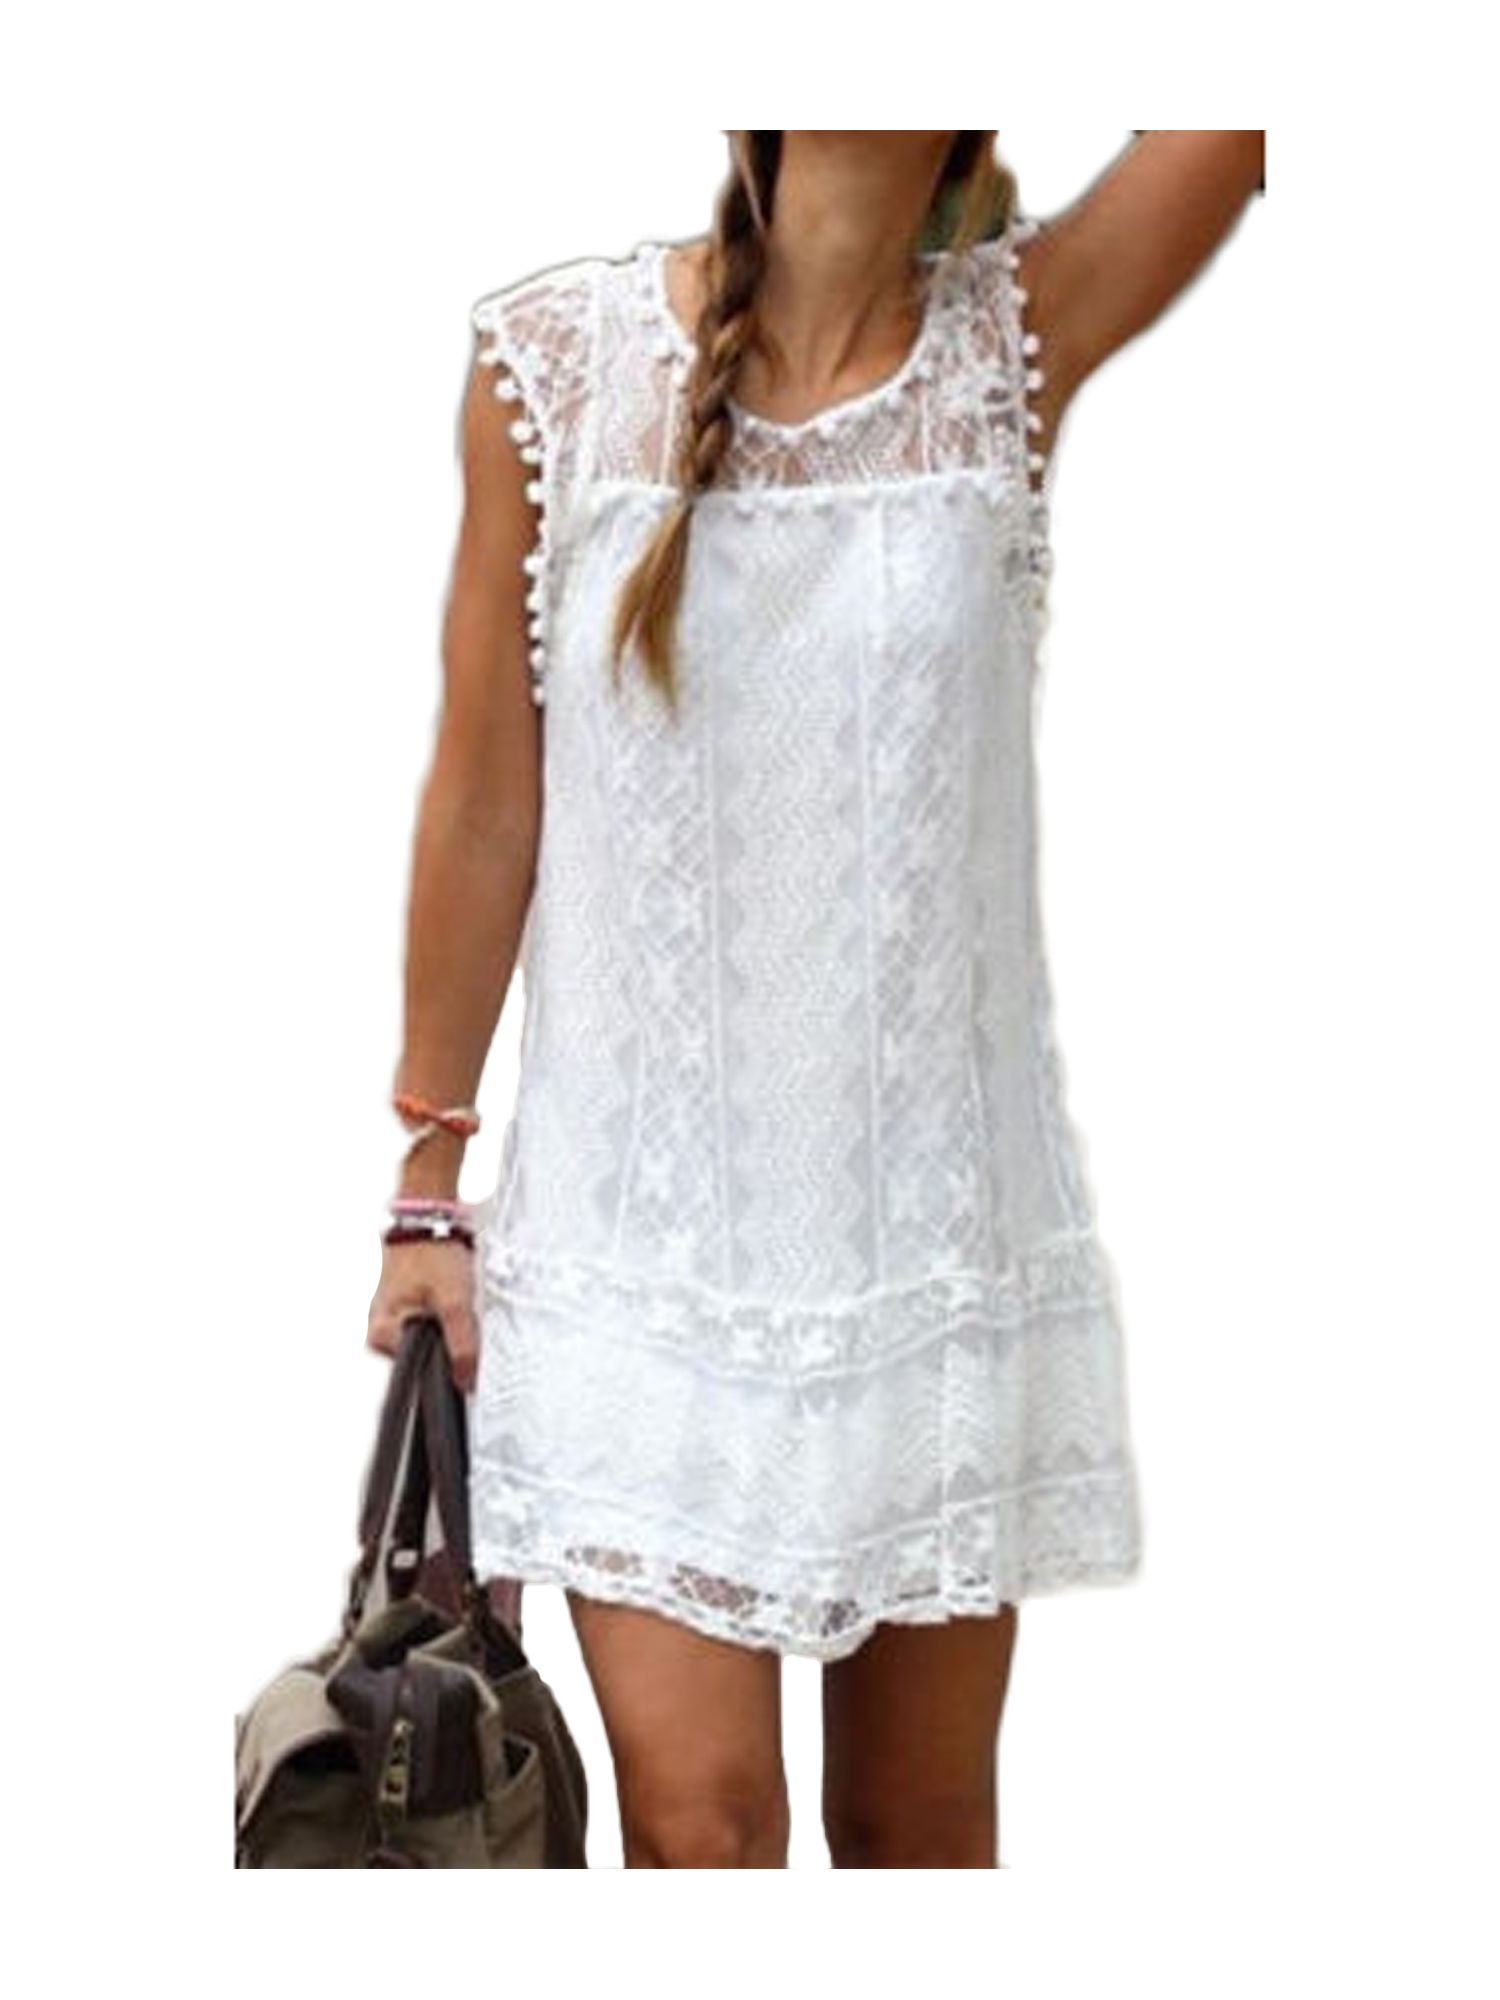 Fiomva Fashion New Women S Summer Casual Sleeveless Evening Party Beach Dress Short Mini Lace Dress White S M L Xl Walmart Com Womens Shift Dresses Lace White Dress Short Mini Dress [ 2000 x 1500 Pixel ]